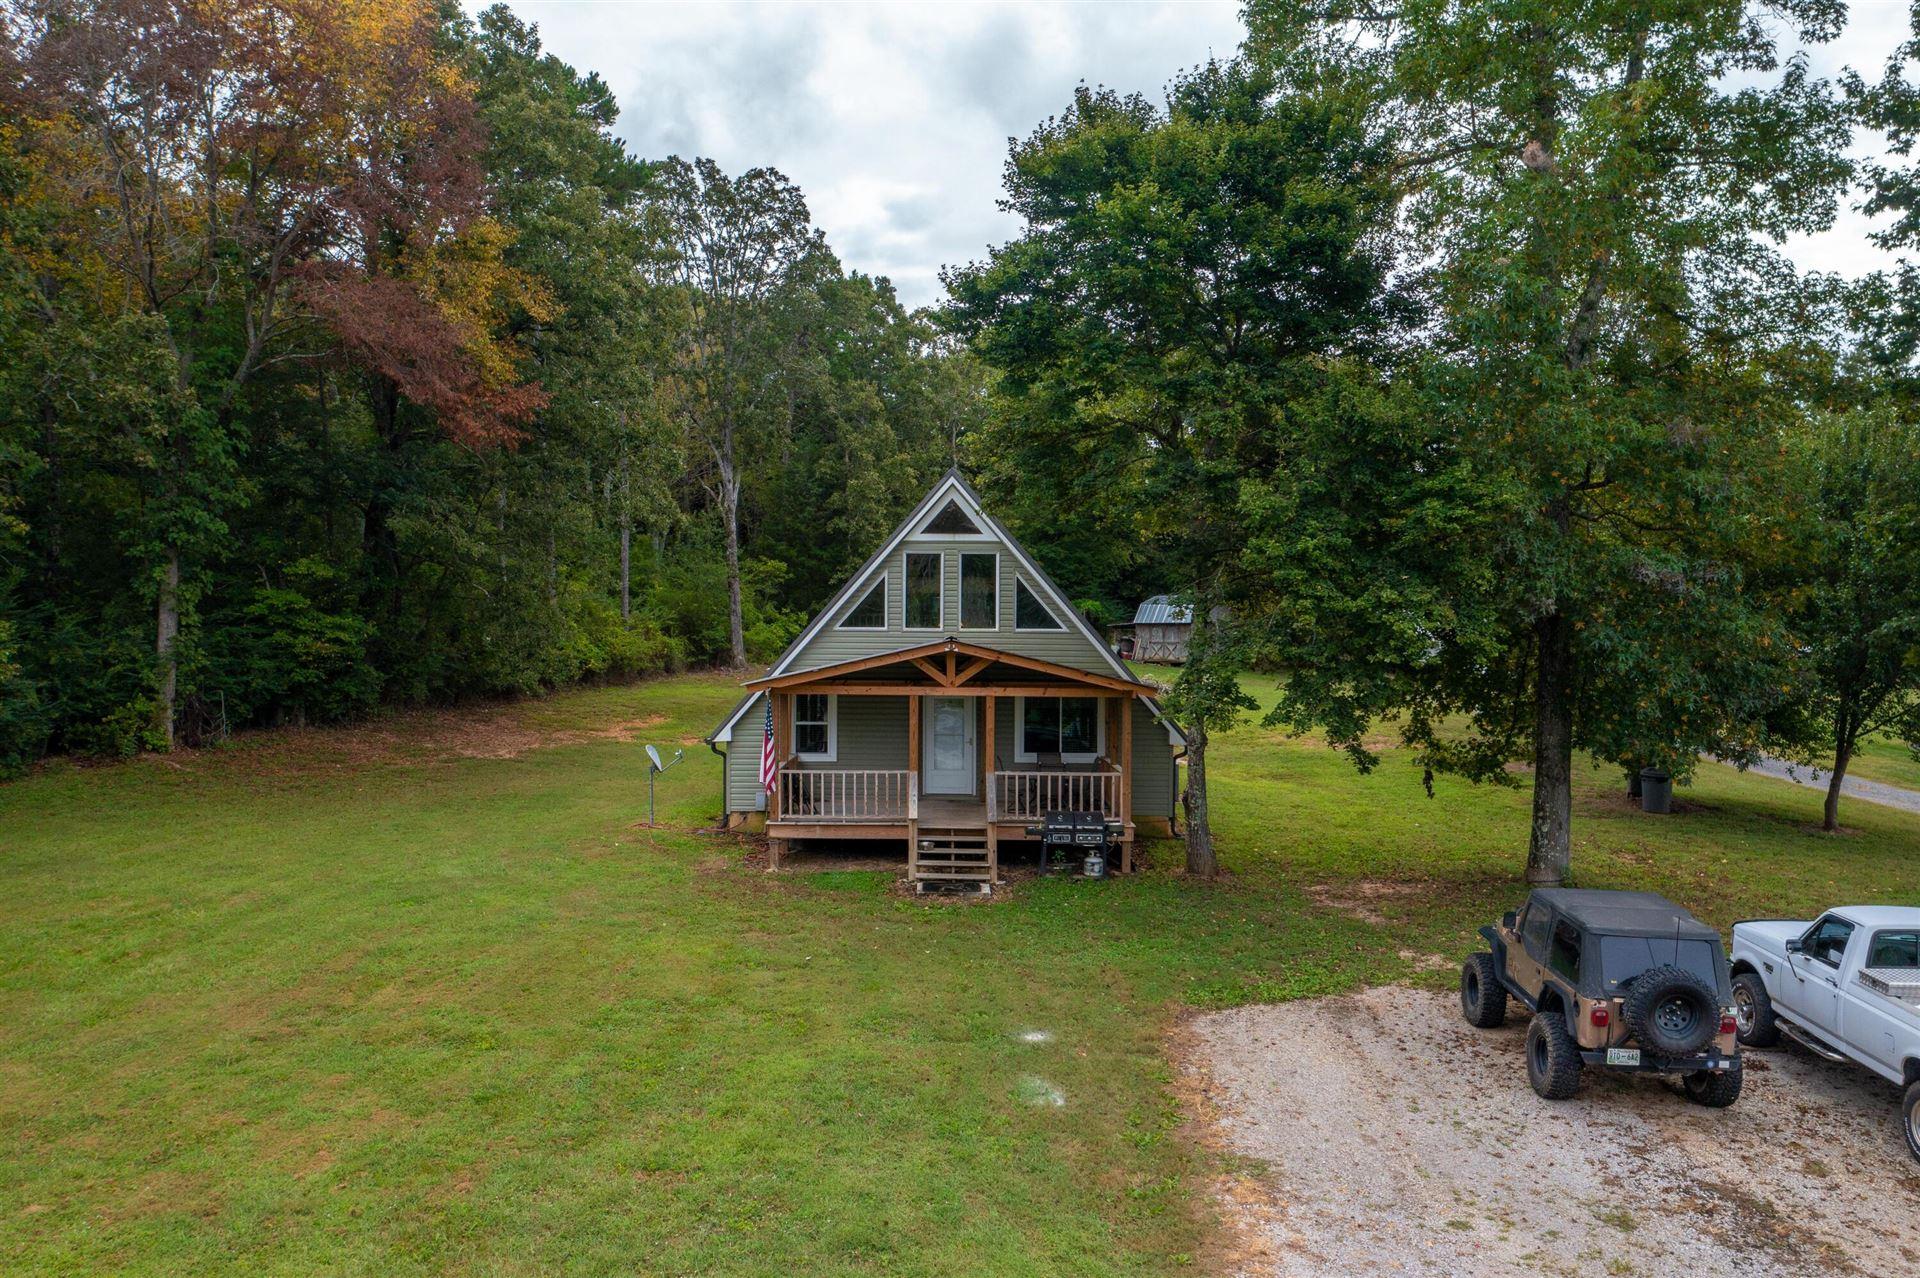 Photo for 12926 Birchwood Pike, Harrison, TN 37341 (MLS # 1343409)